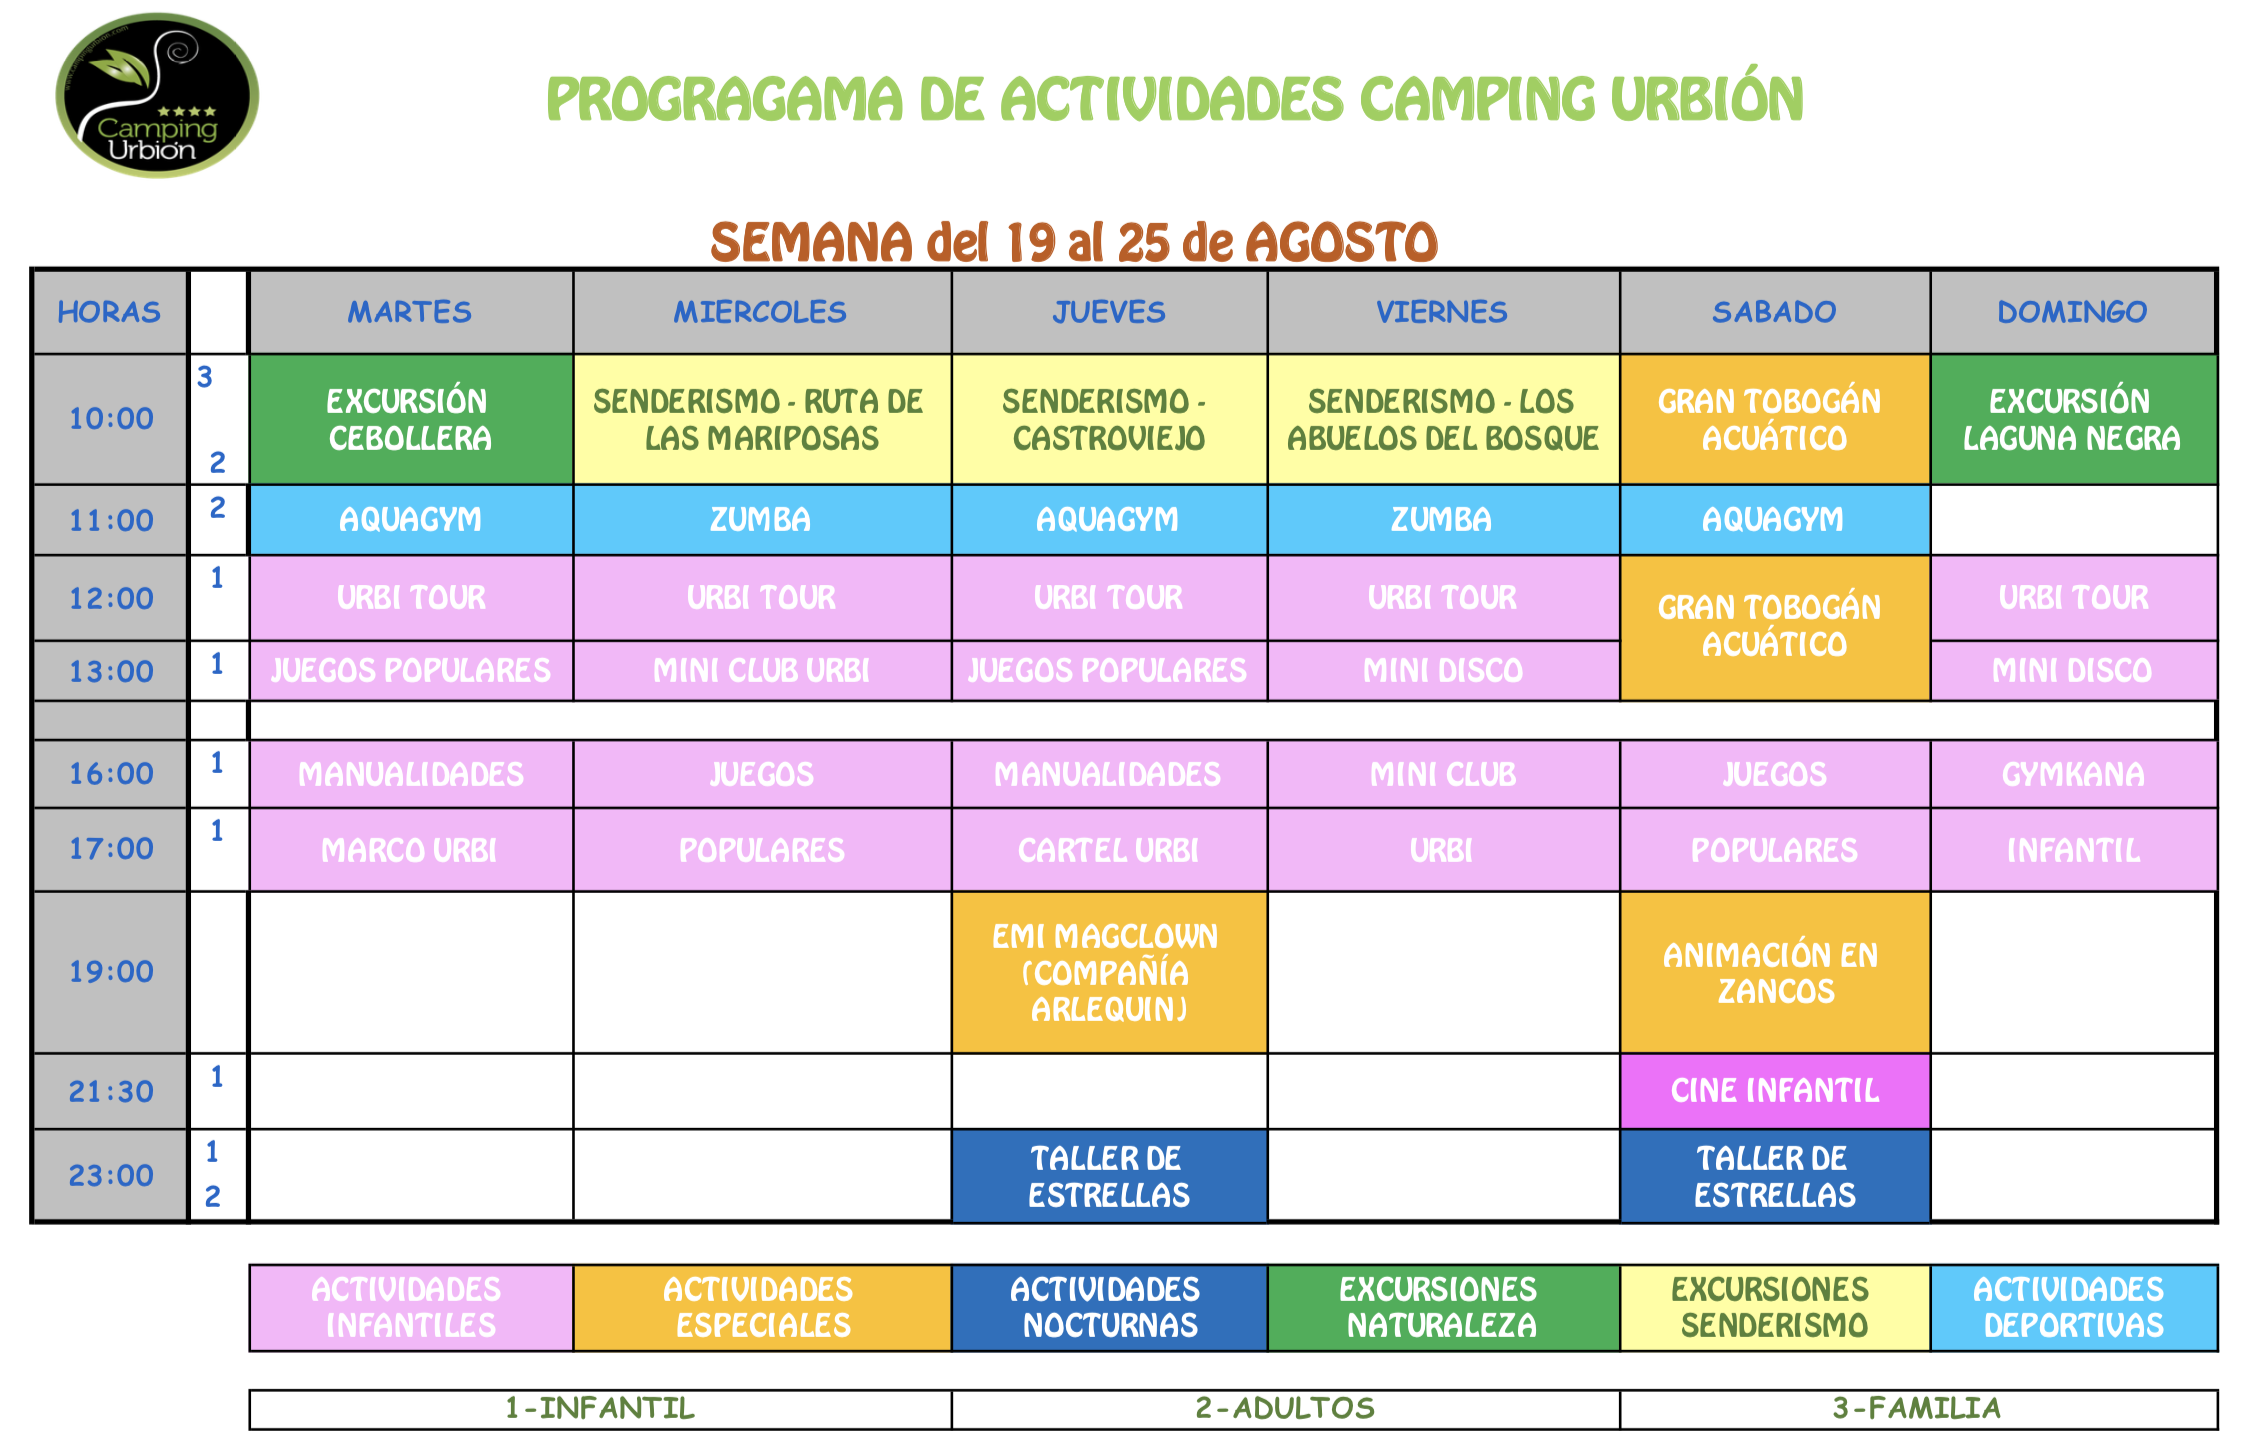 ACTIVIDADES VERANO CAMPING URBION 2